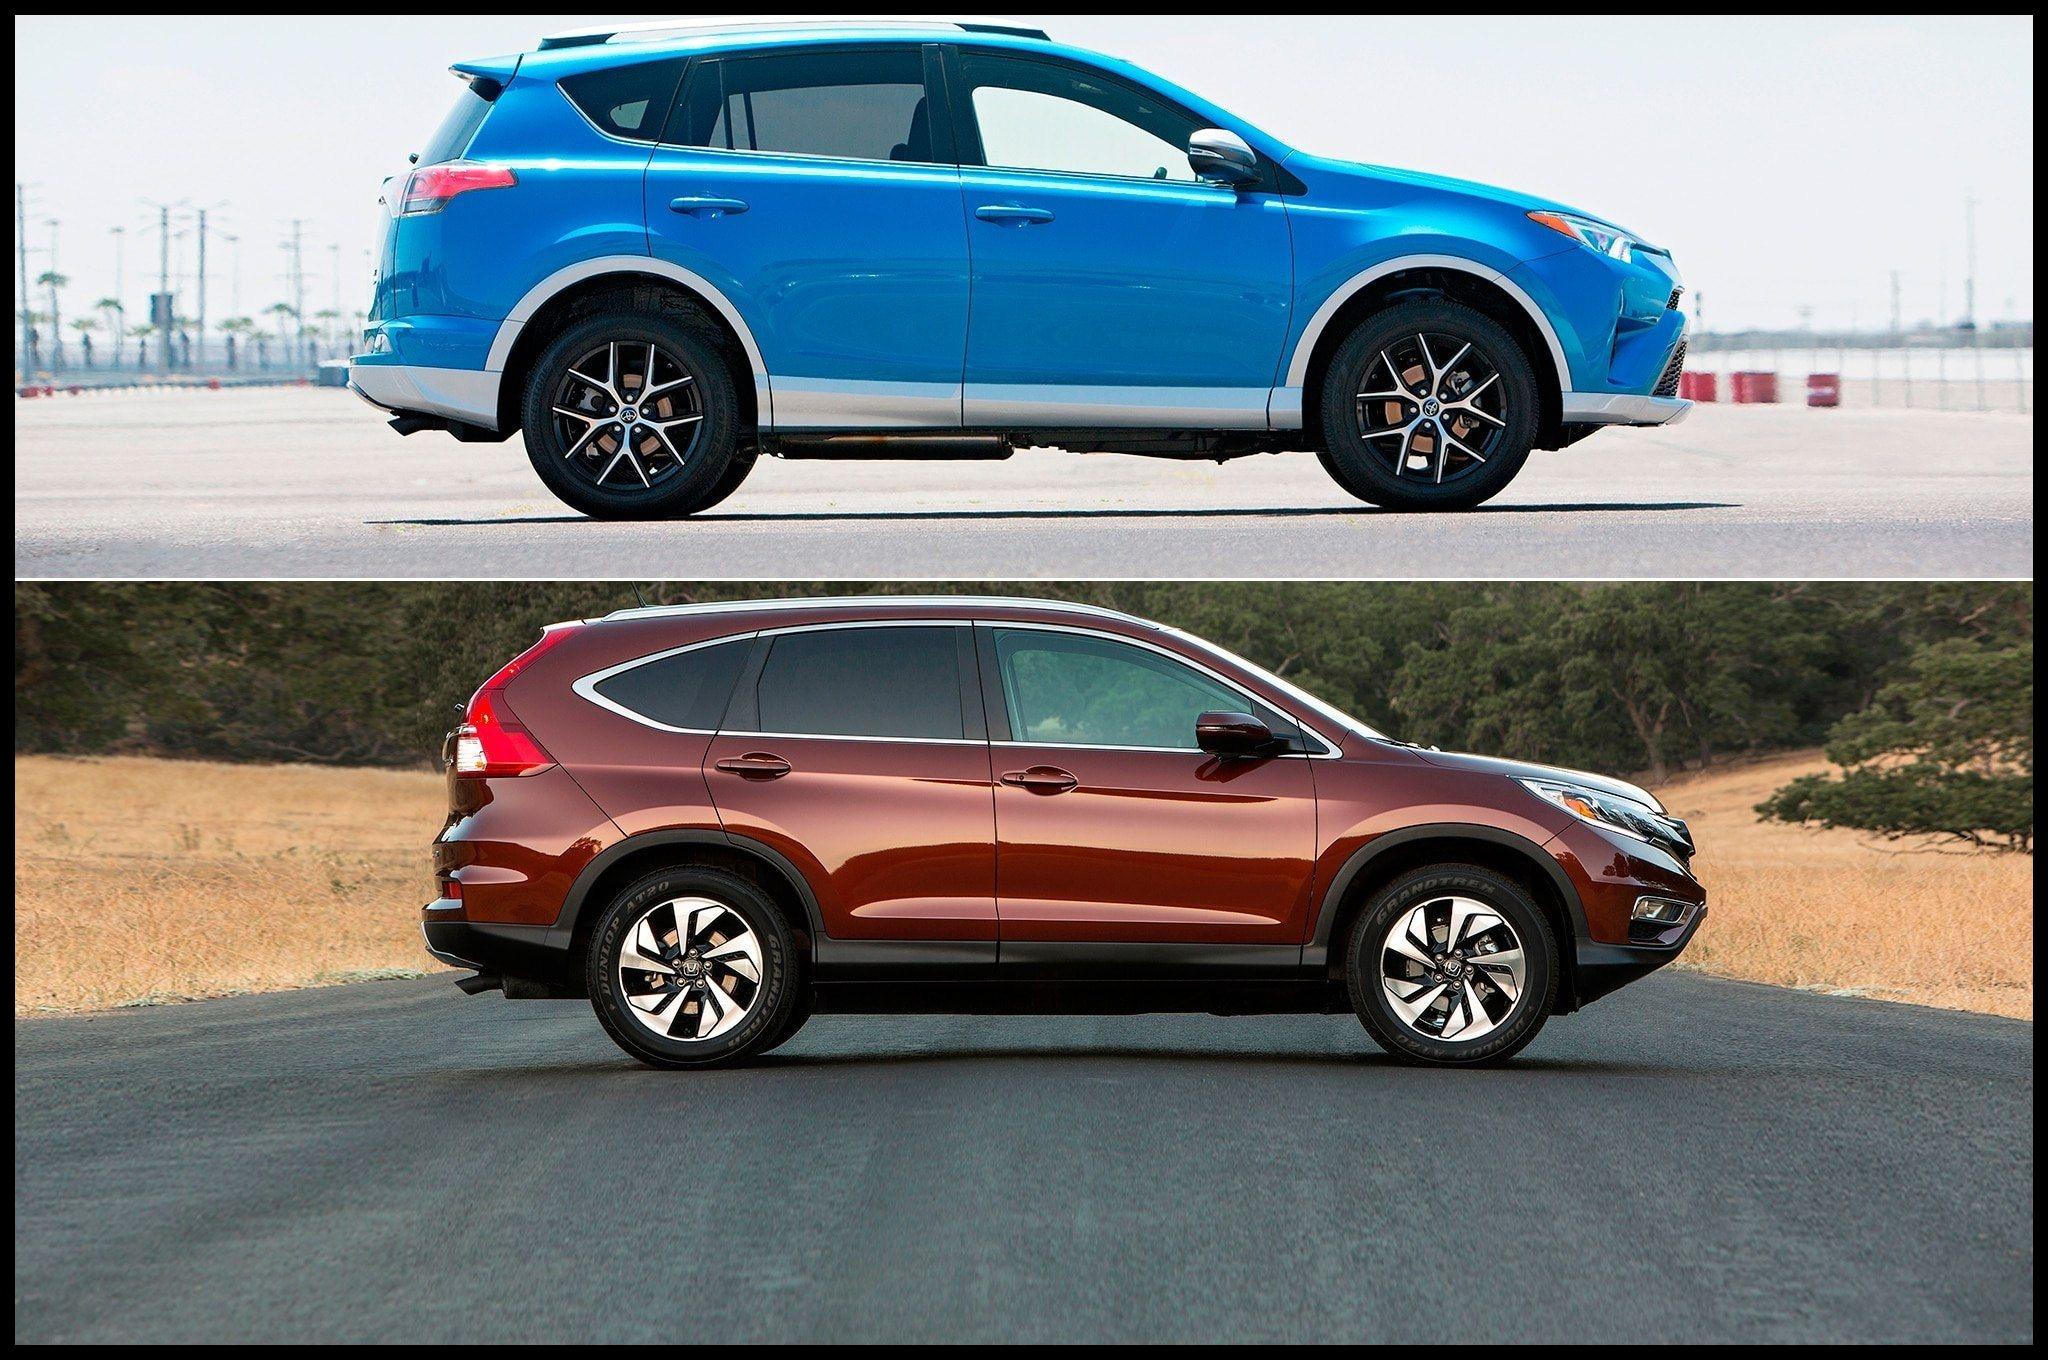 Hot News Honda Crv Vs toyota Rav4 Crv Vs toyota Exterior